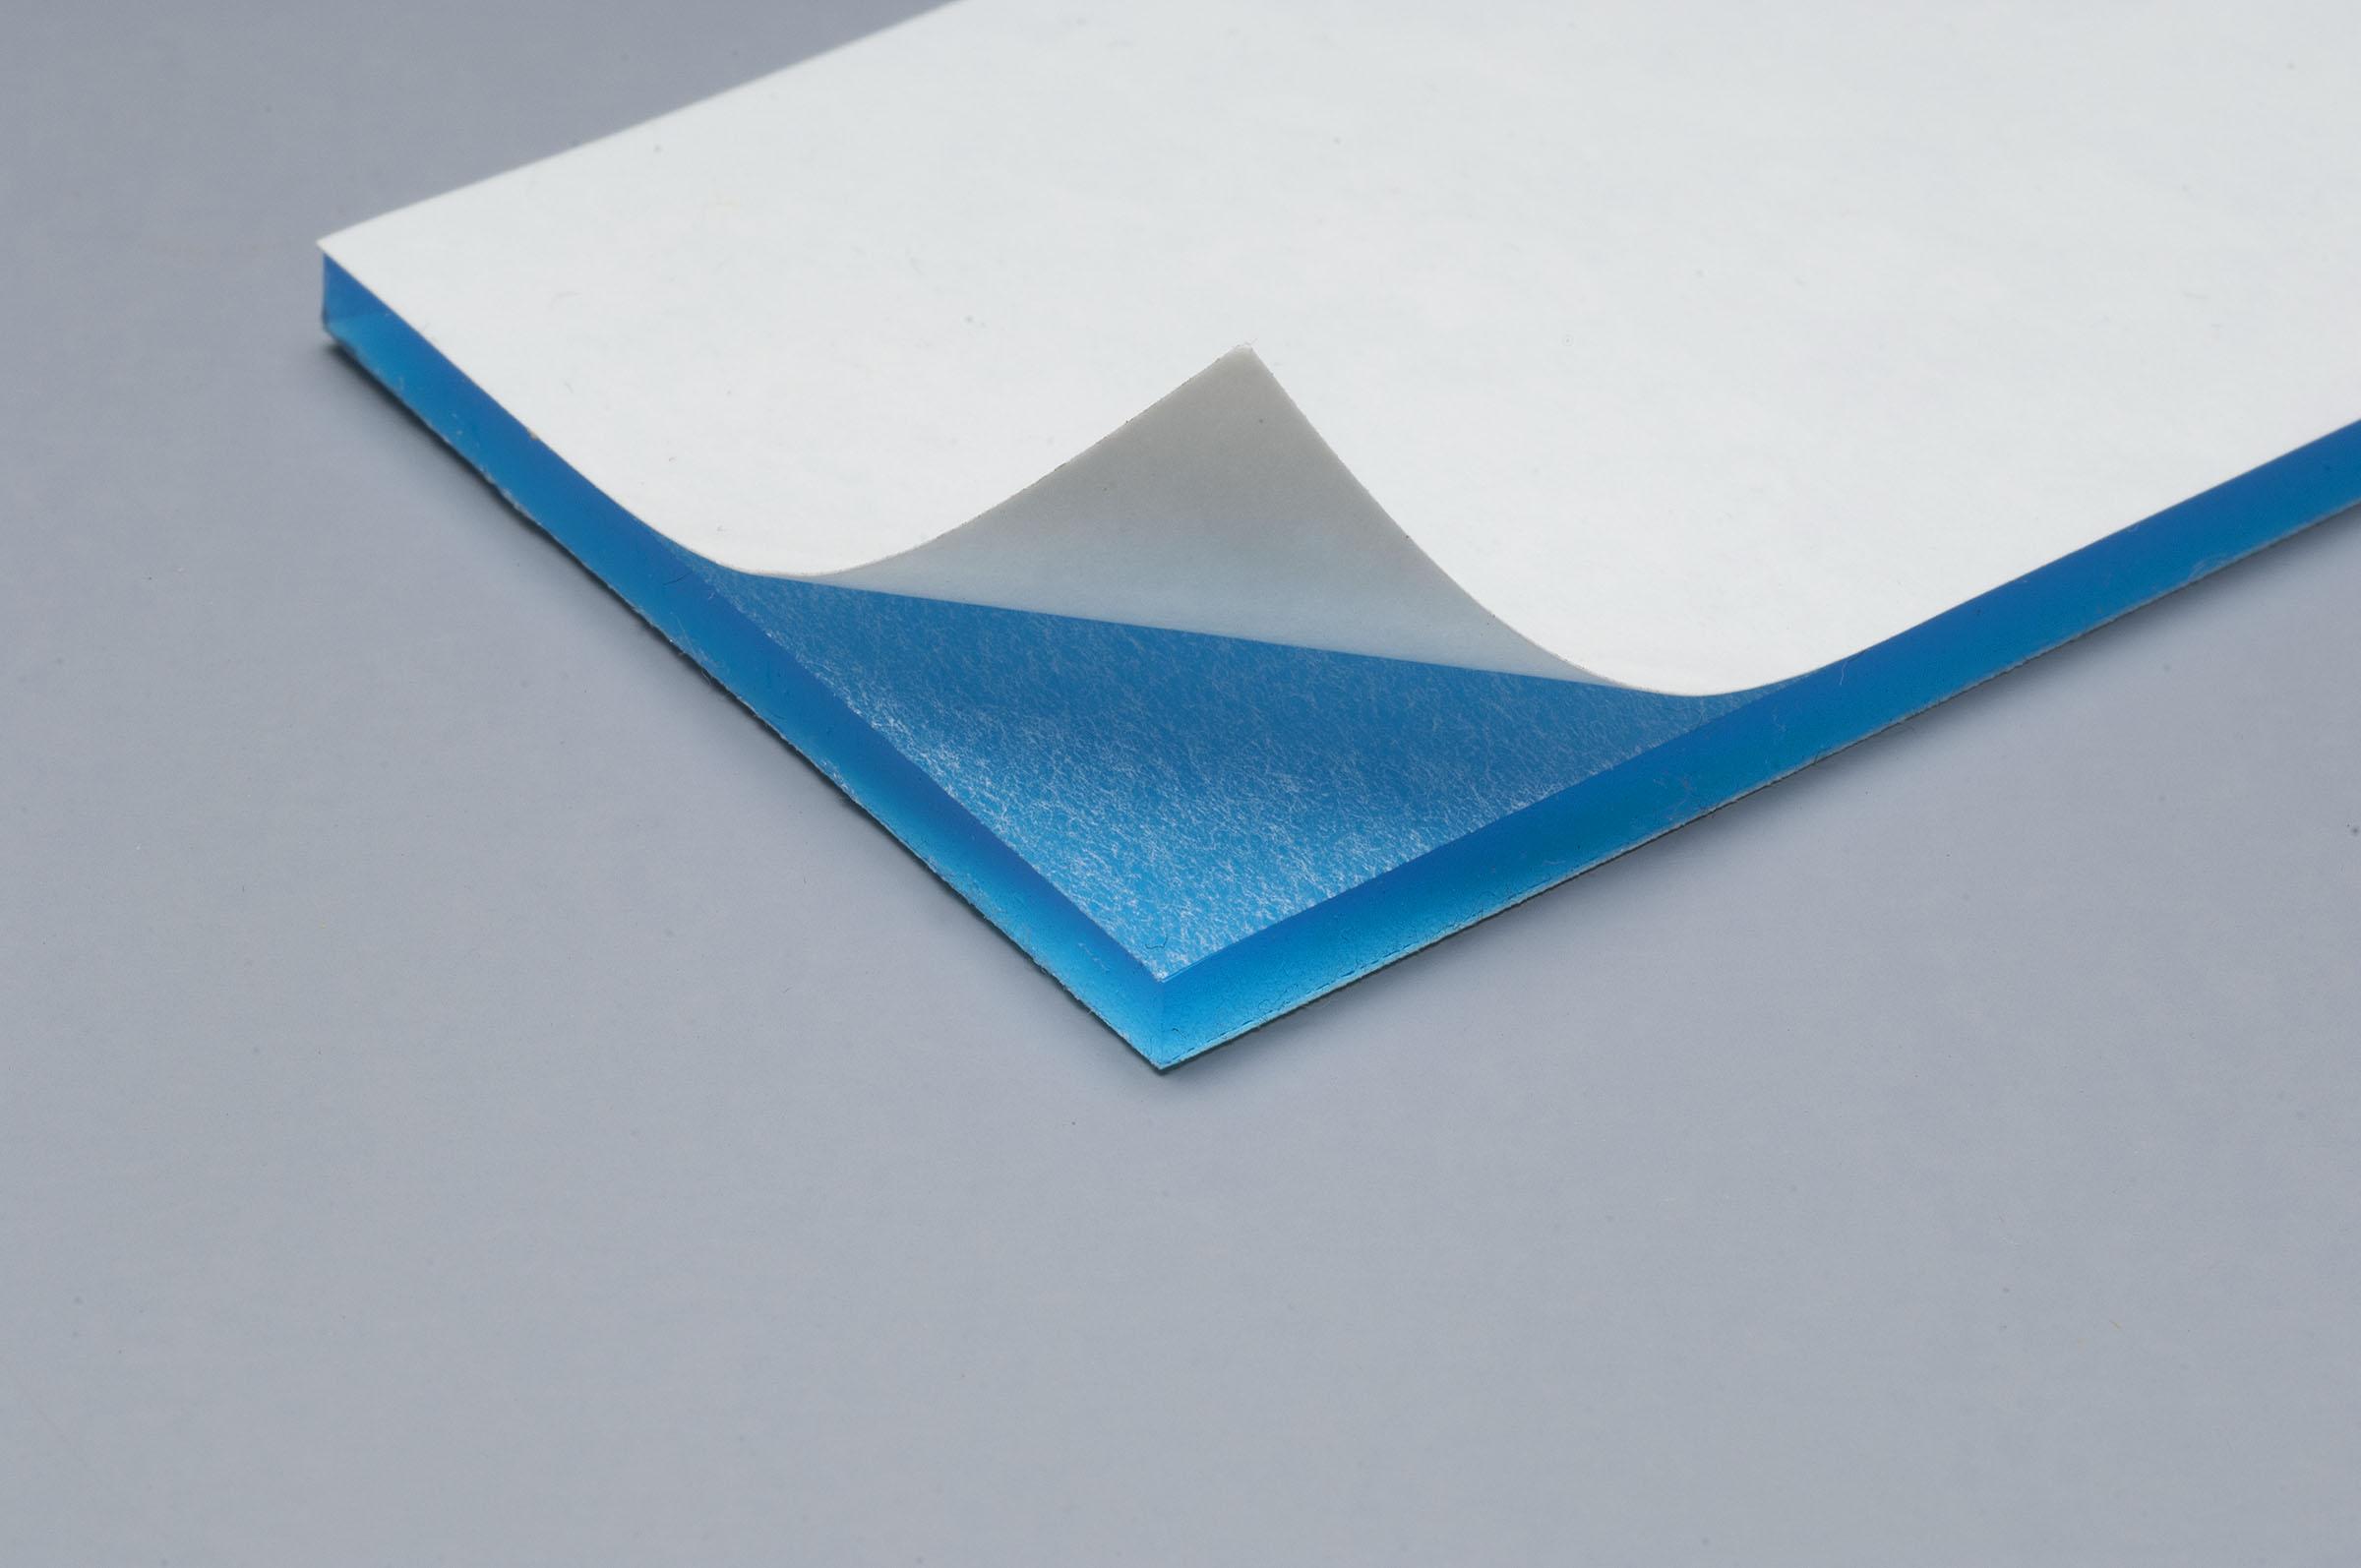 Vibration Absorption Sheet 3mm